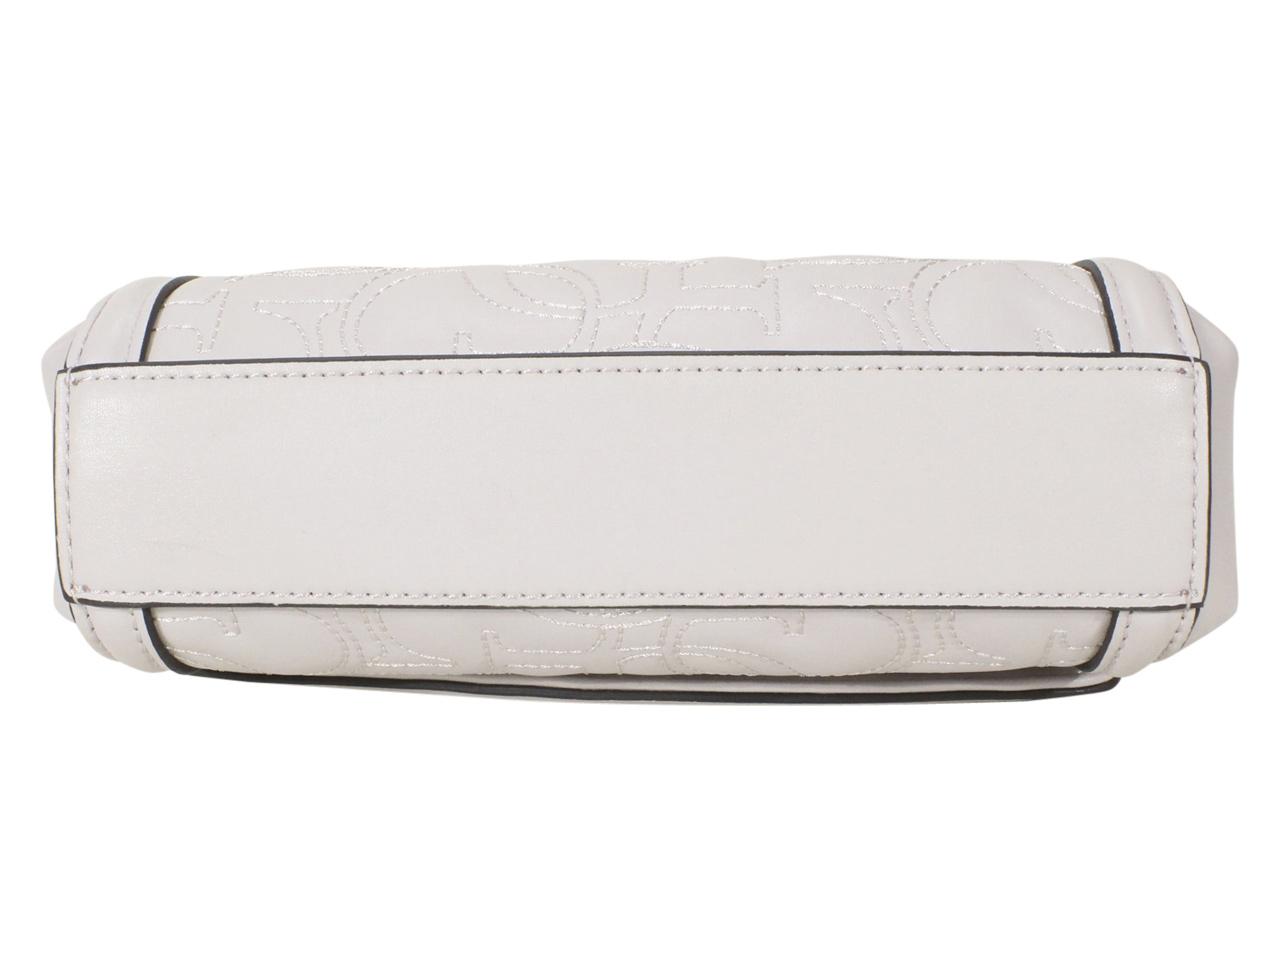 Guess Women/'s New Wave Mini Convertible Crossbody Handbag